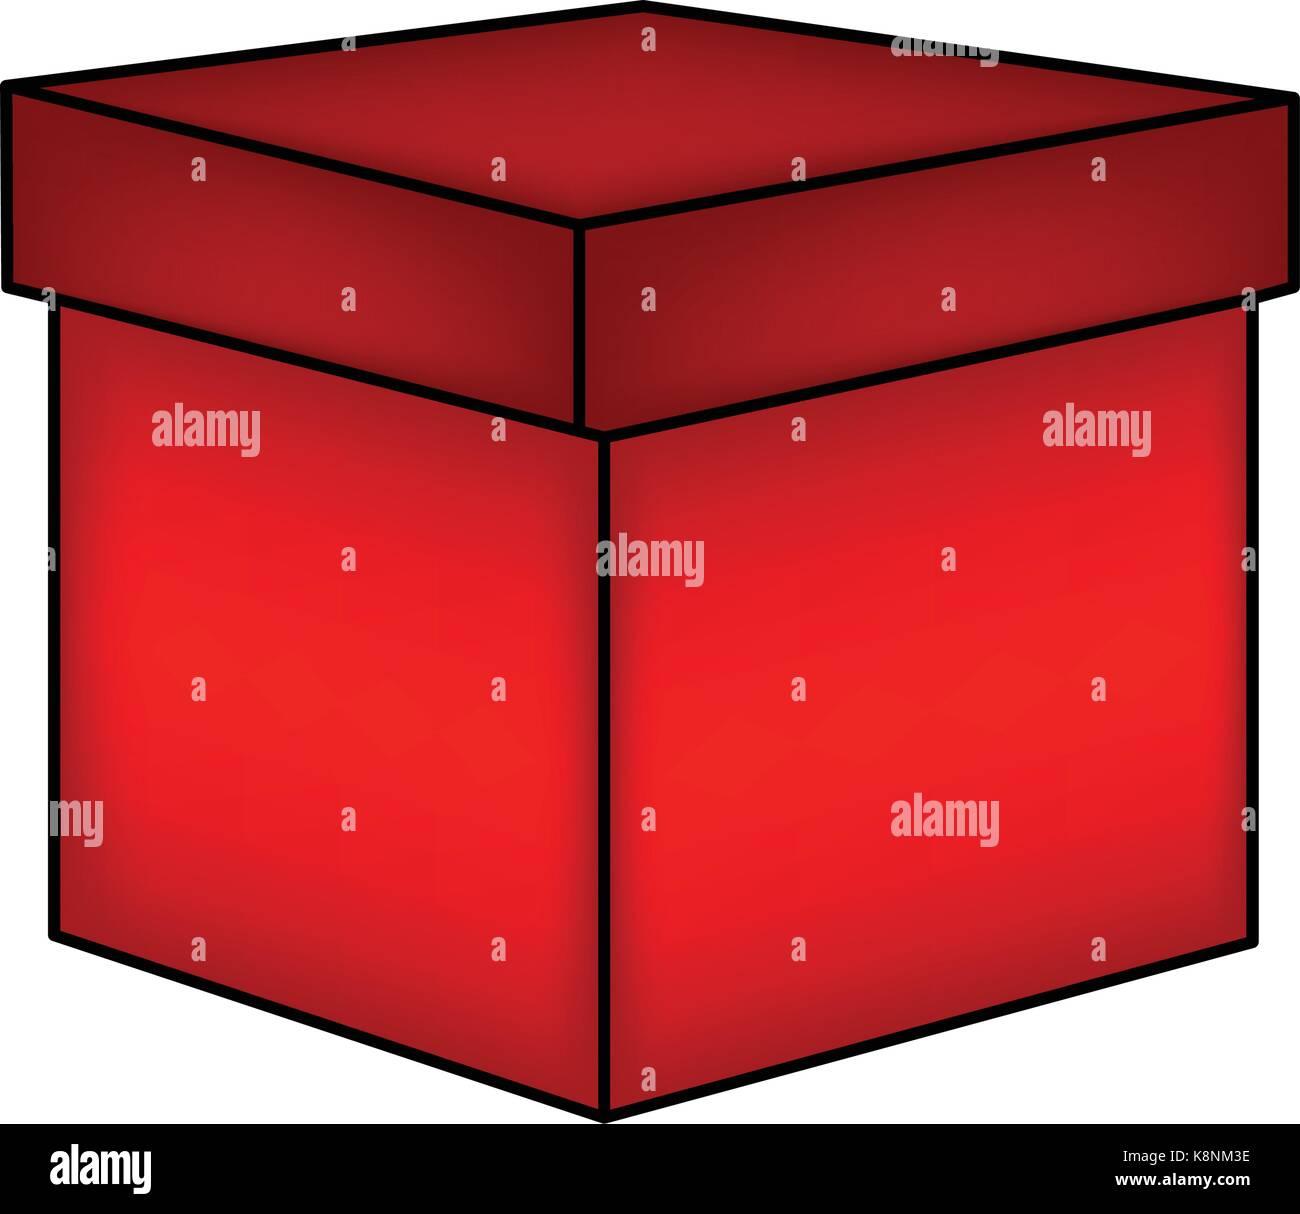 christmas box, gift icon, symbol, design. vector illustration isolated on white background. - Stock Image